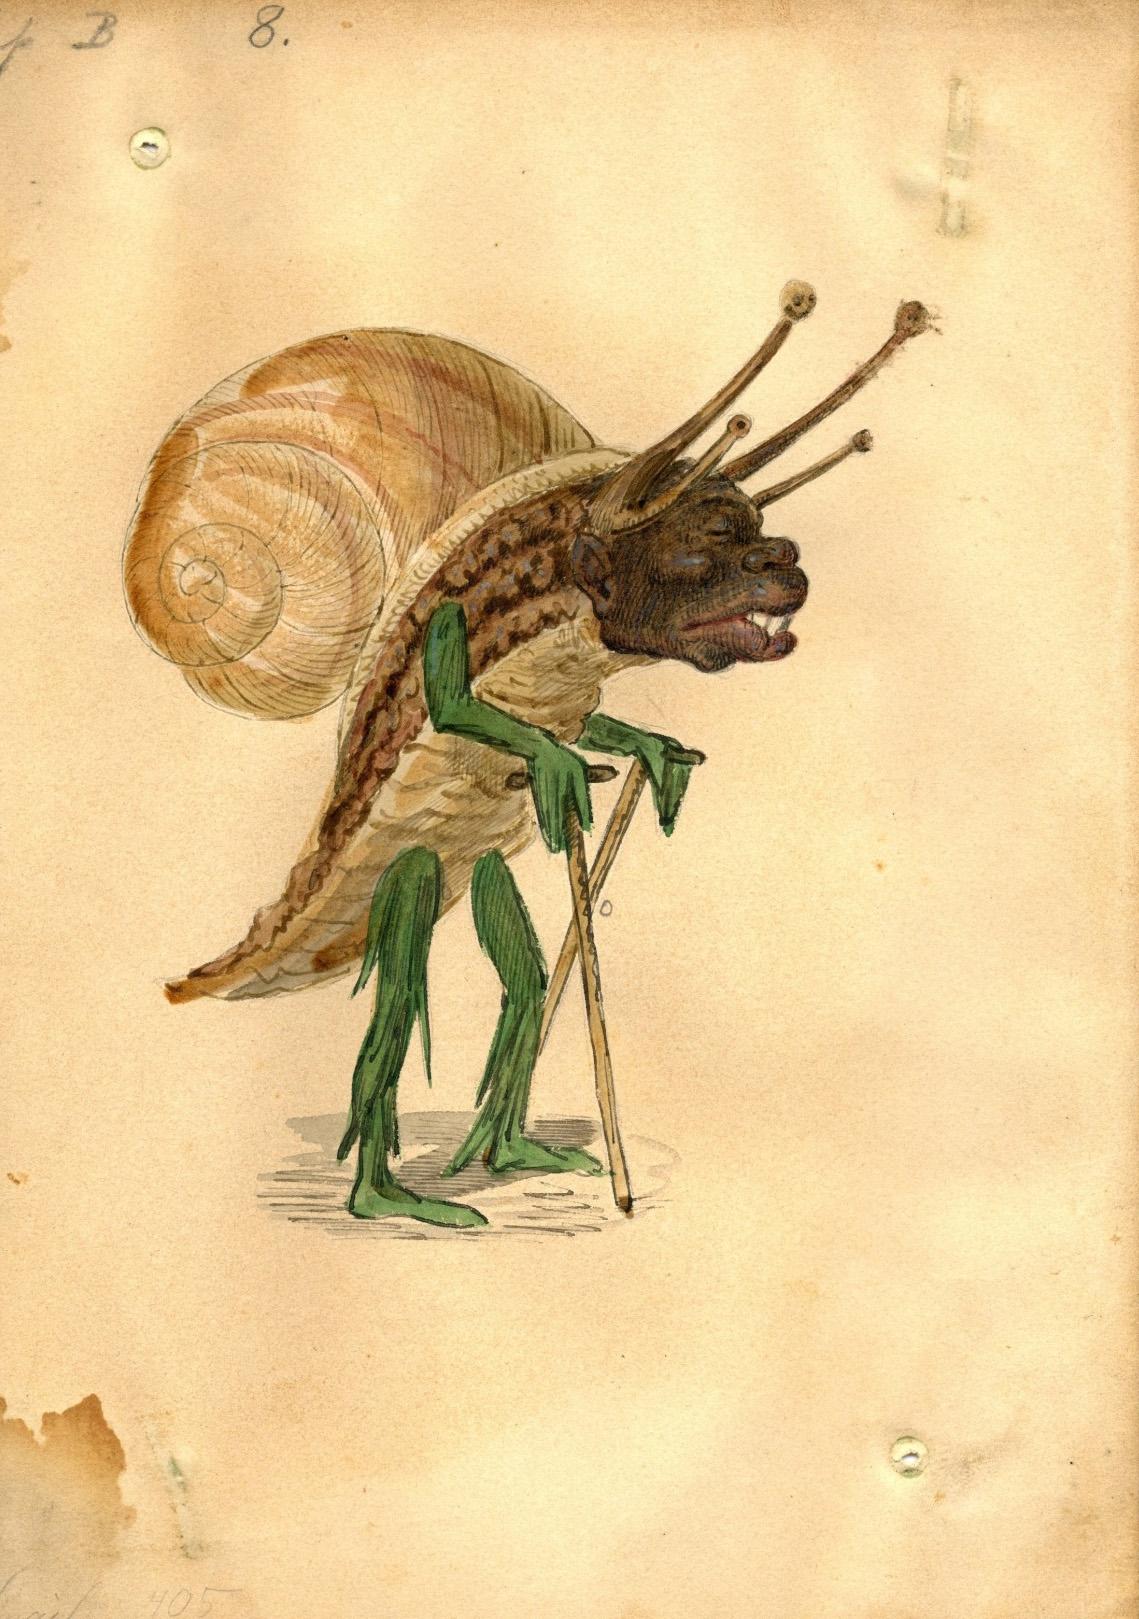 Charles Briton - Snail Costume Design, 1873